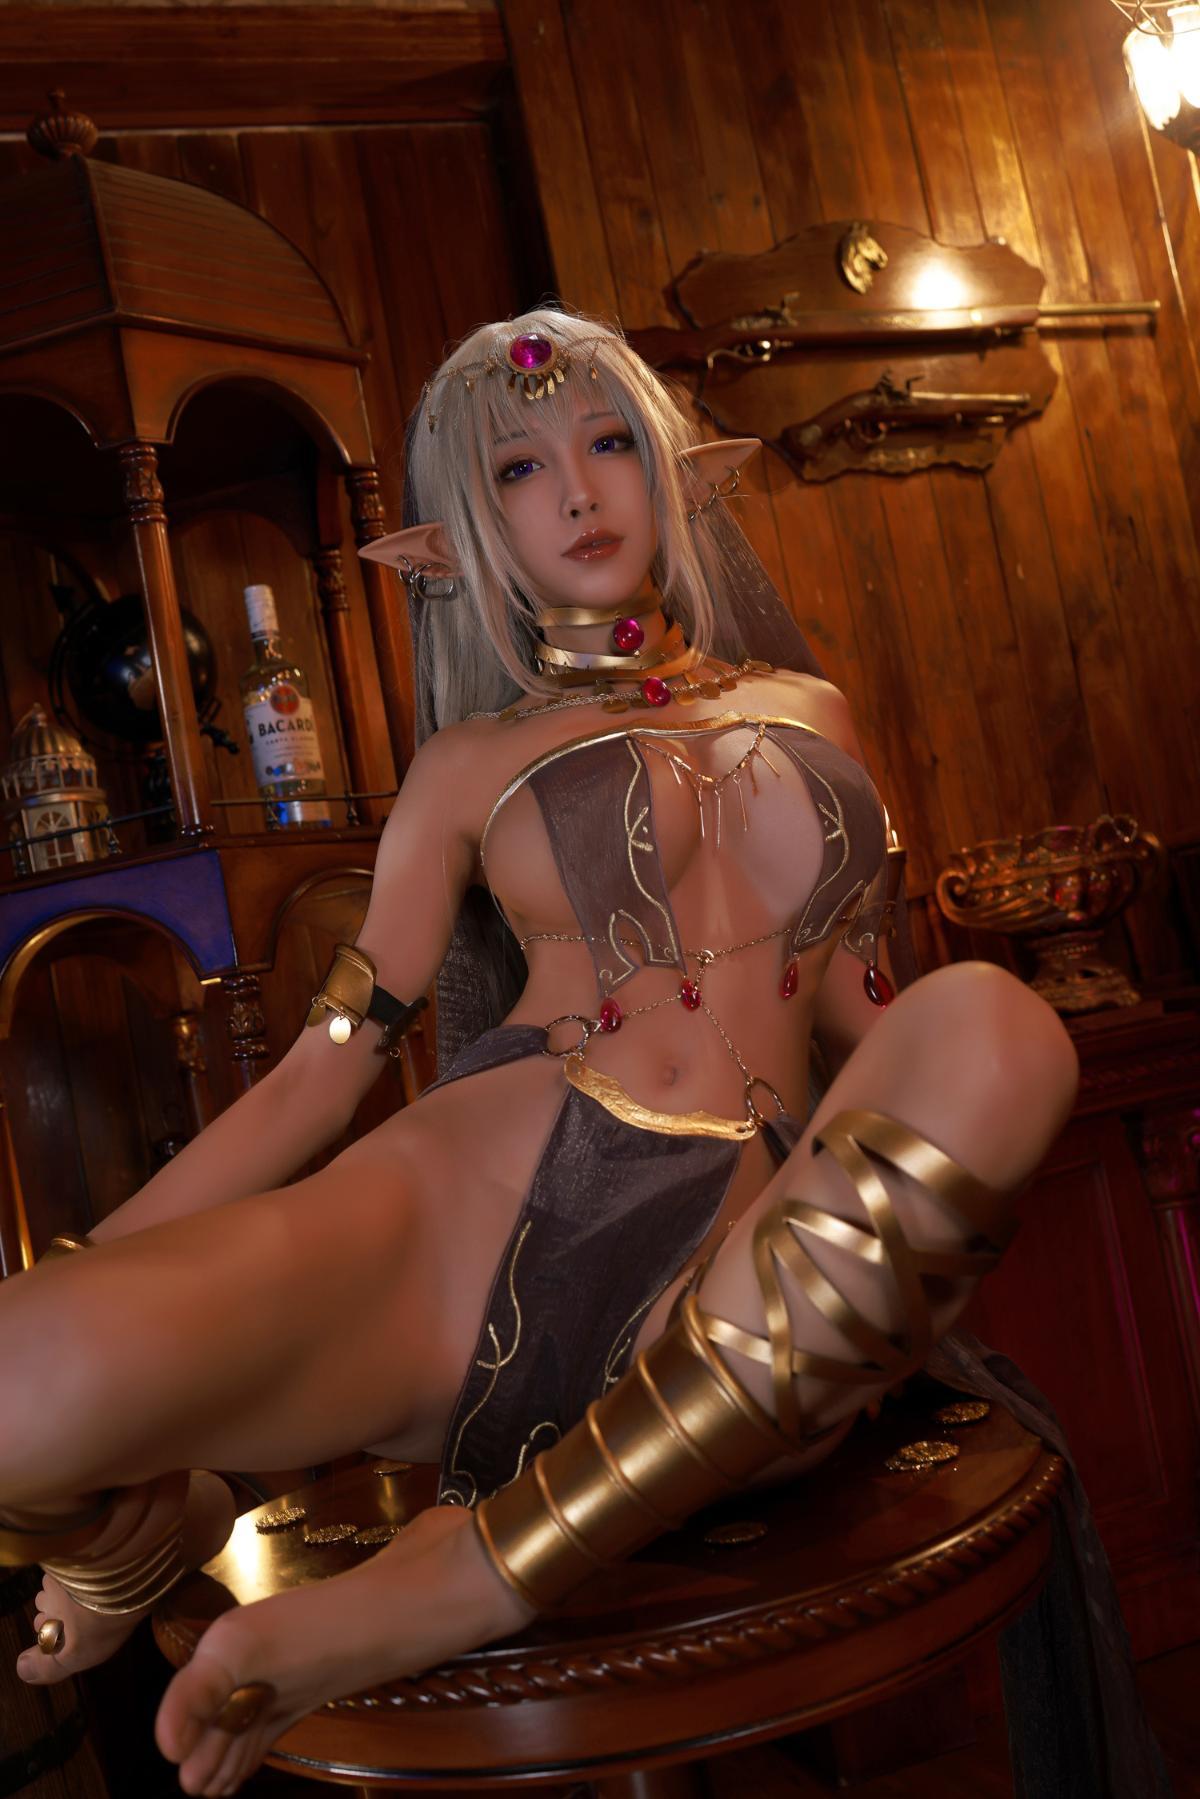 Tan Dancer Elf Succubus Cosplay by Aqua 3